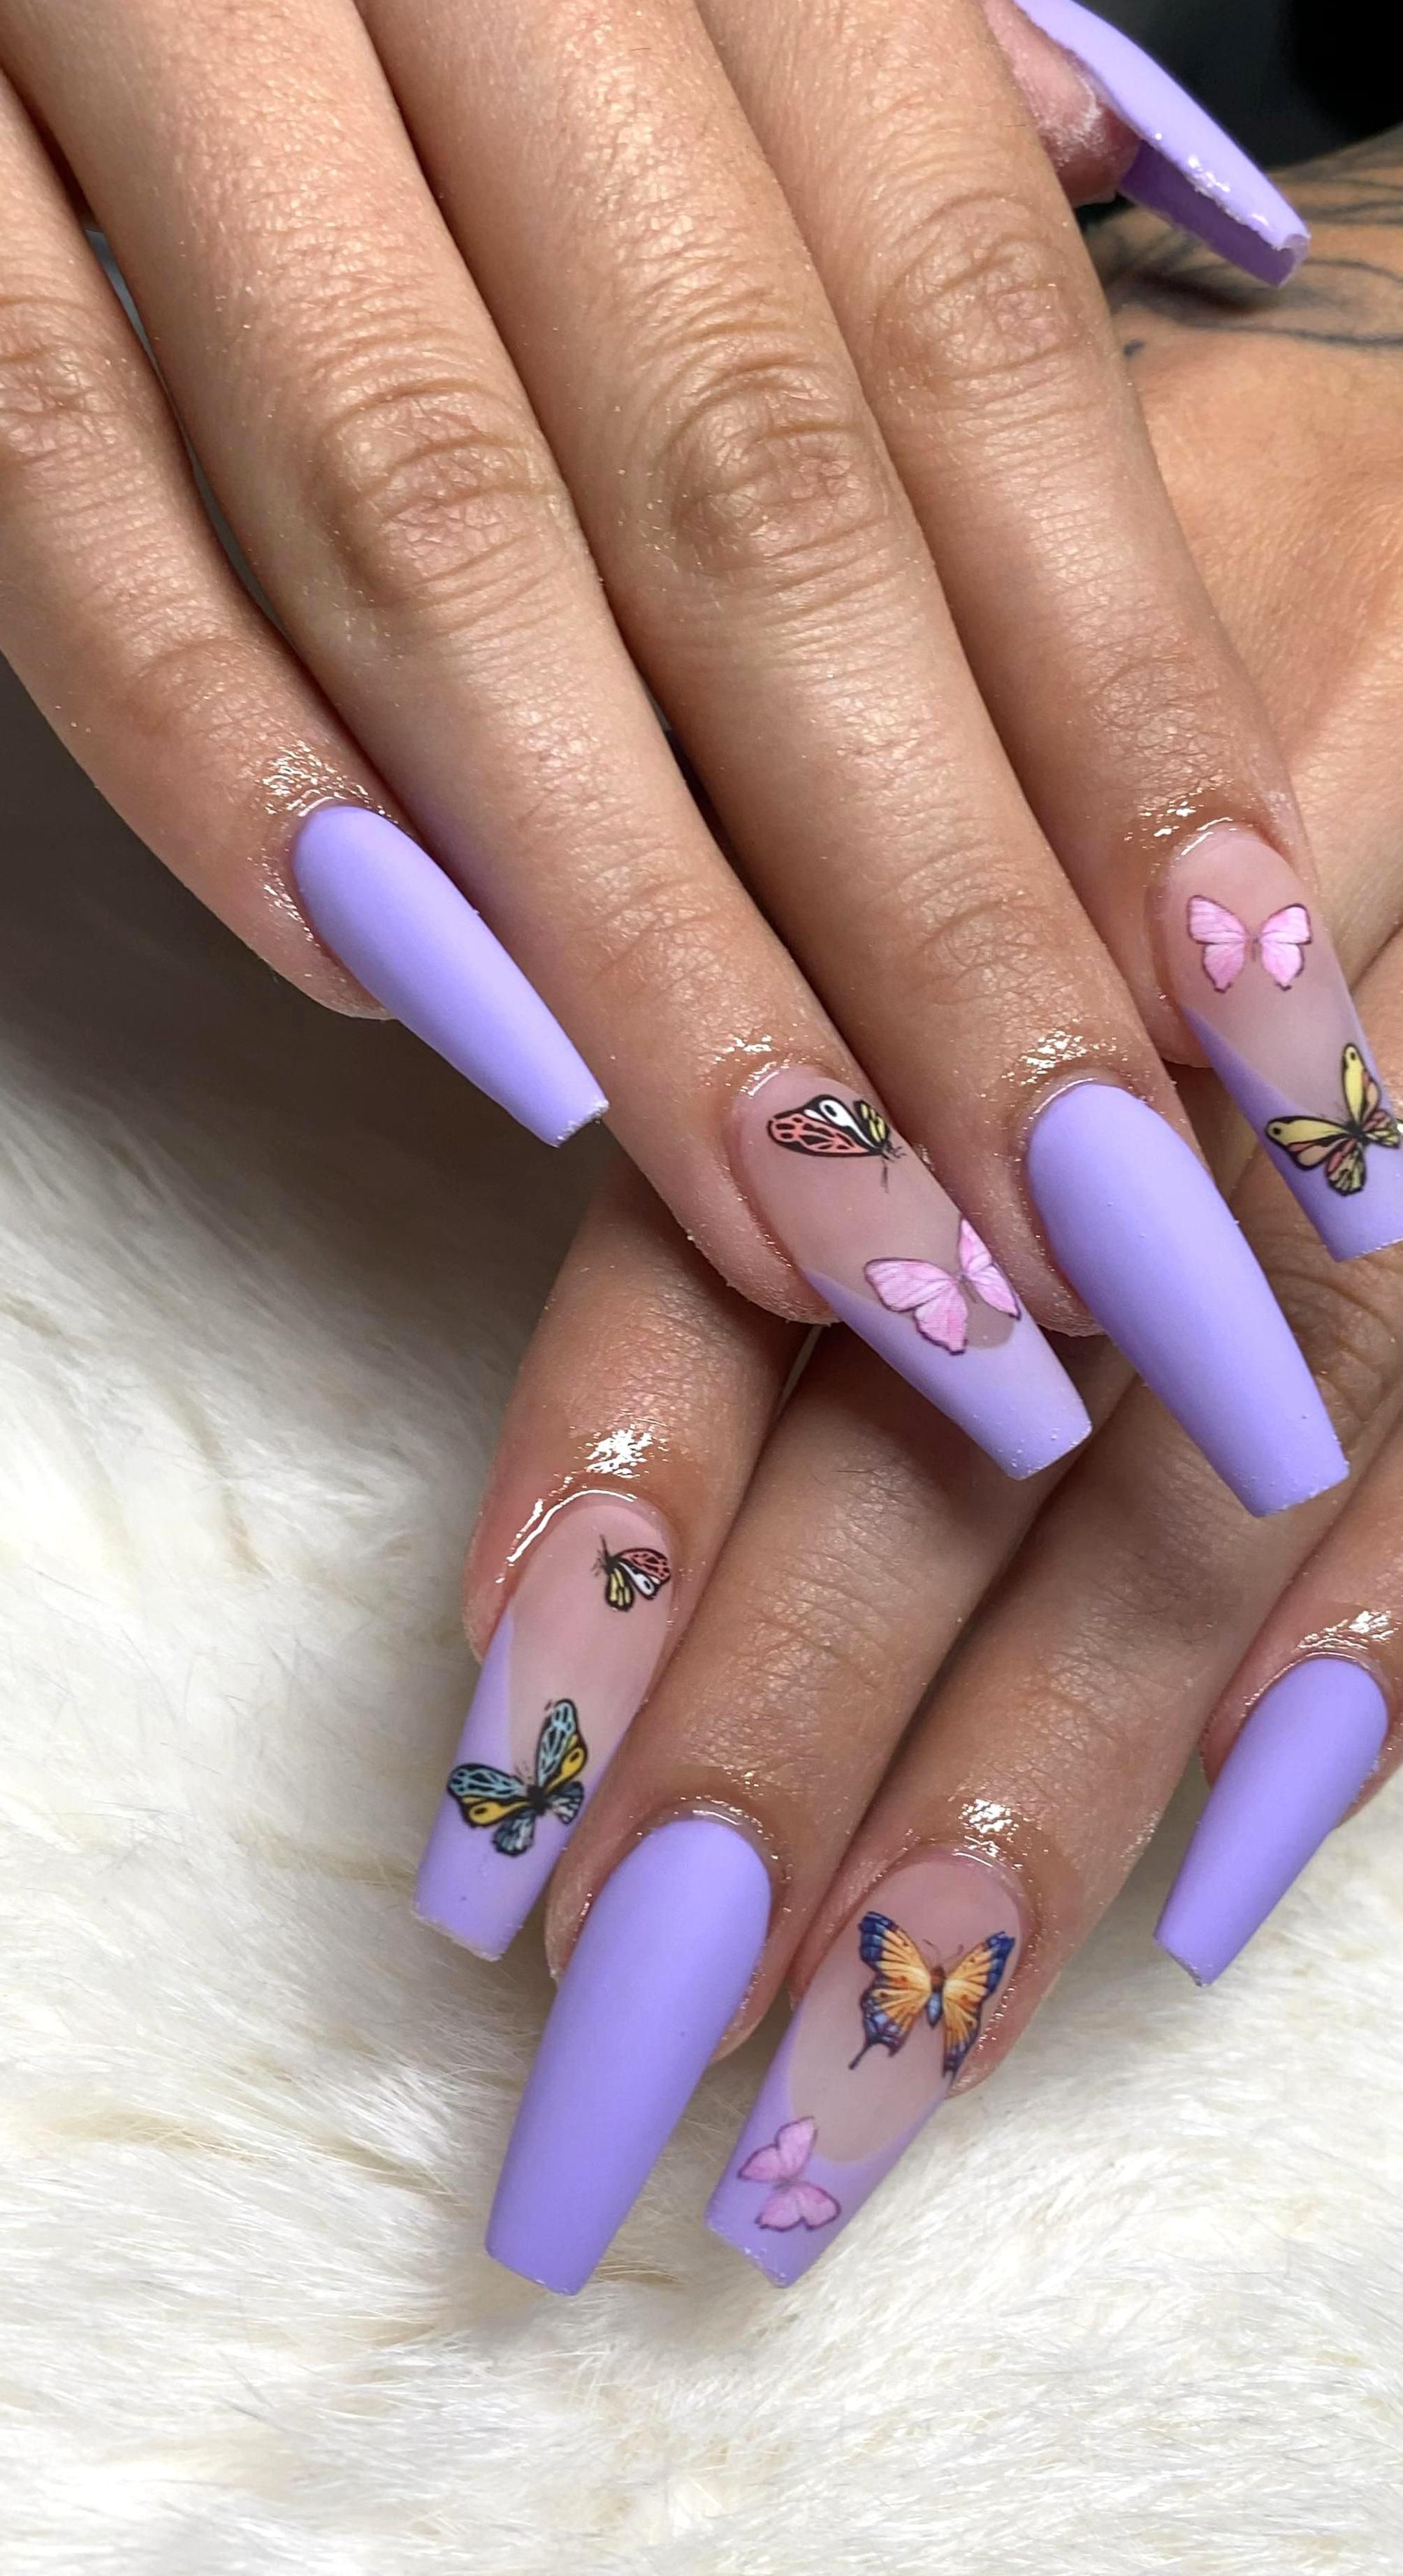 Nail Salon Near Me Nab Nail Bar Butterfly Nails Book Now In 2020 Purple Acrylic Nails Gel Nails Purple Nails